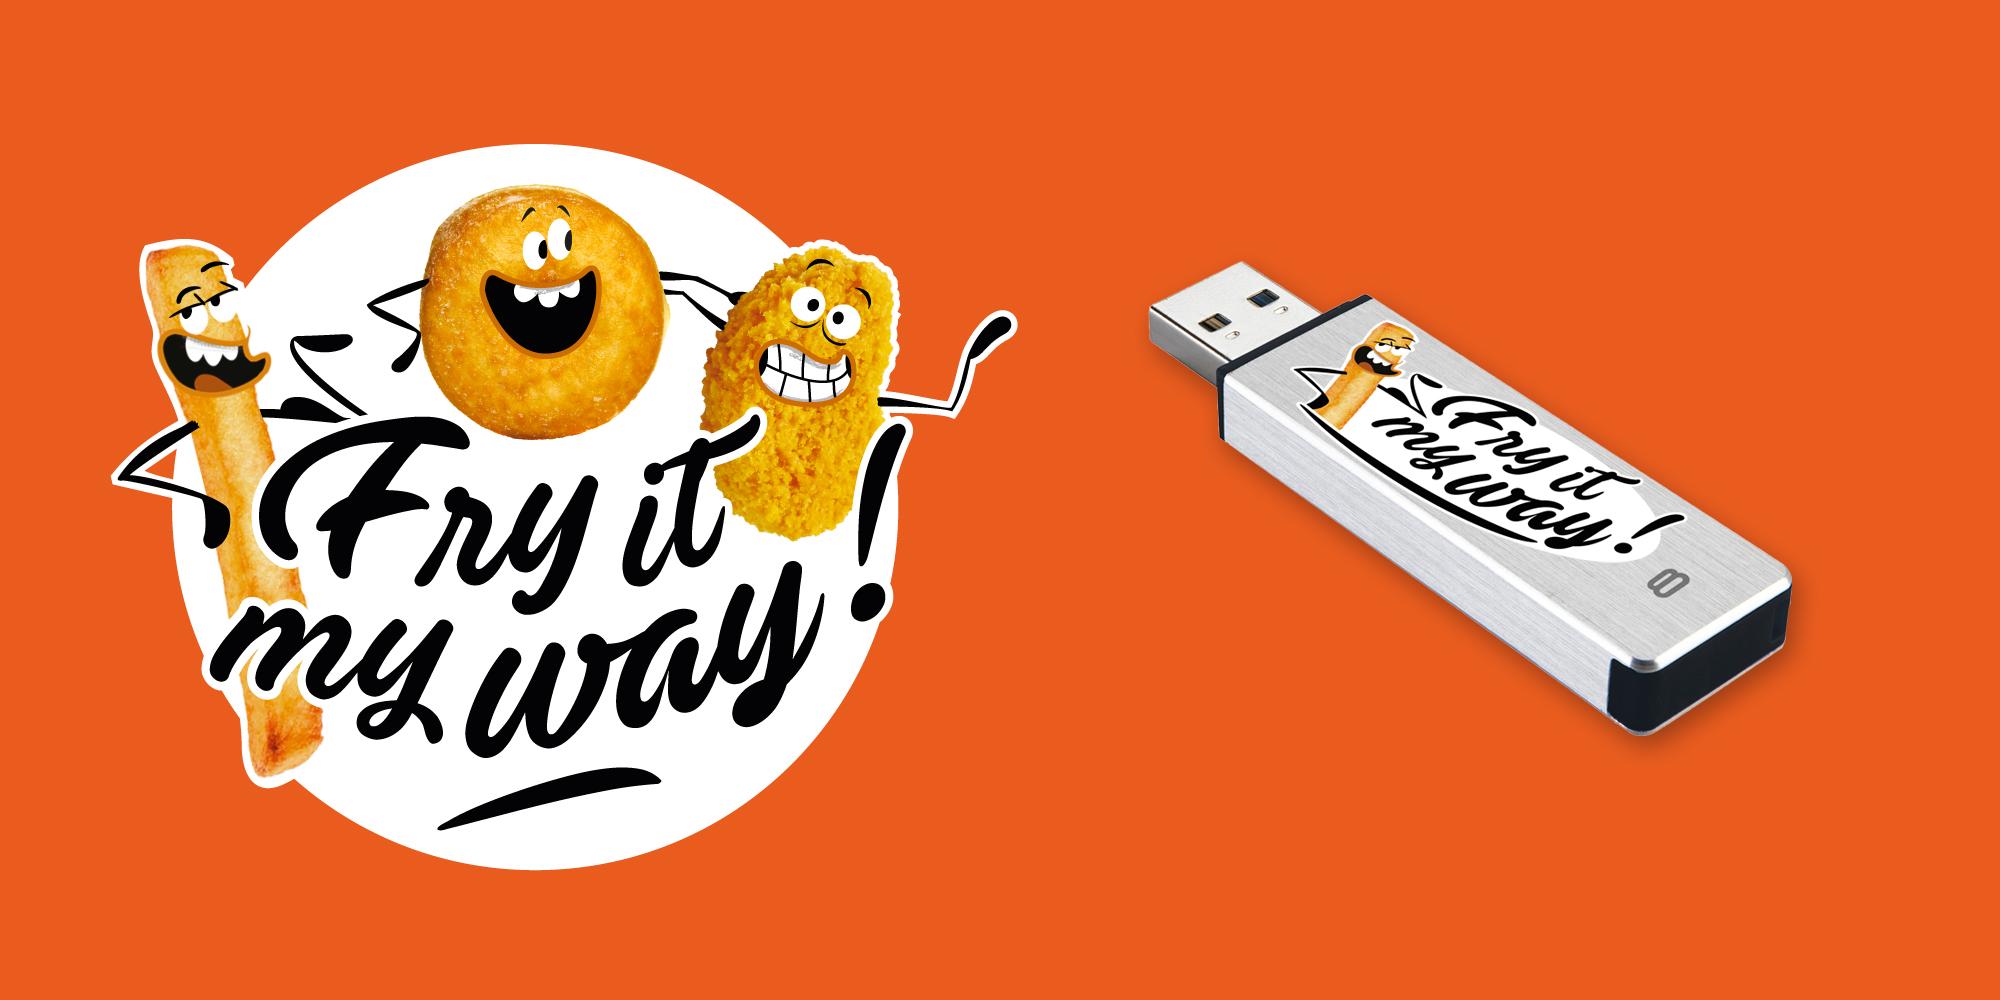 logo fry it my way